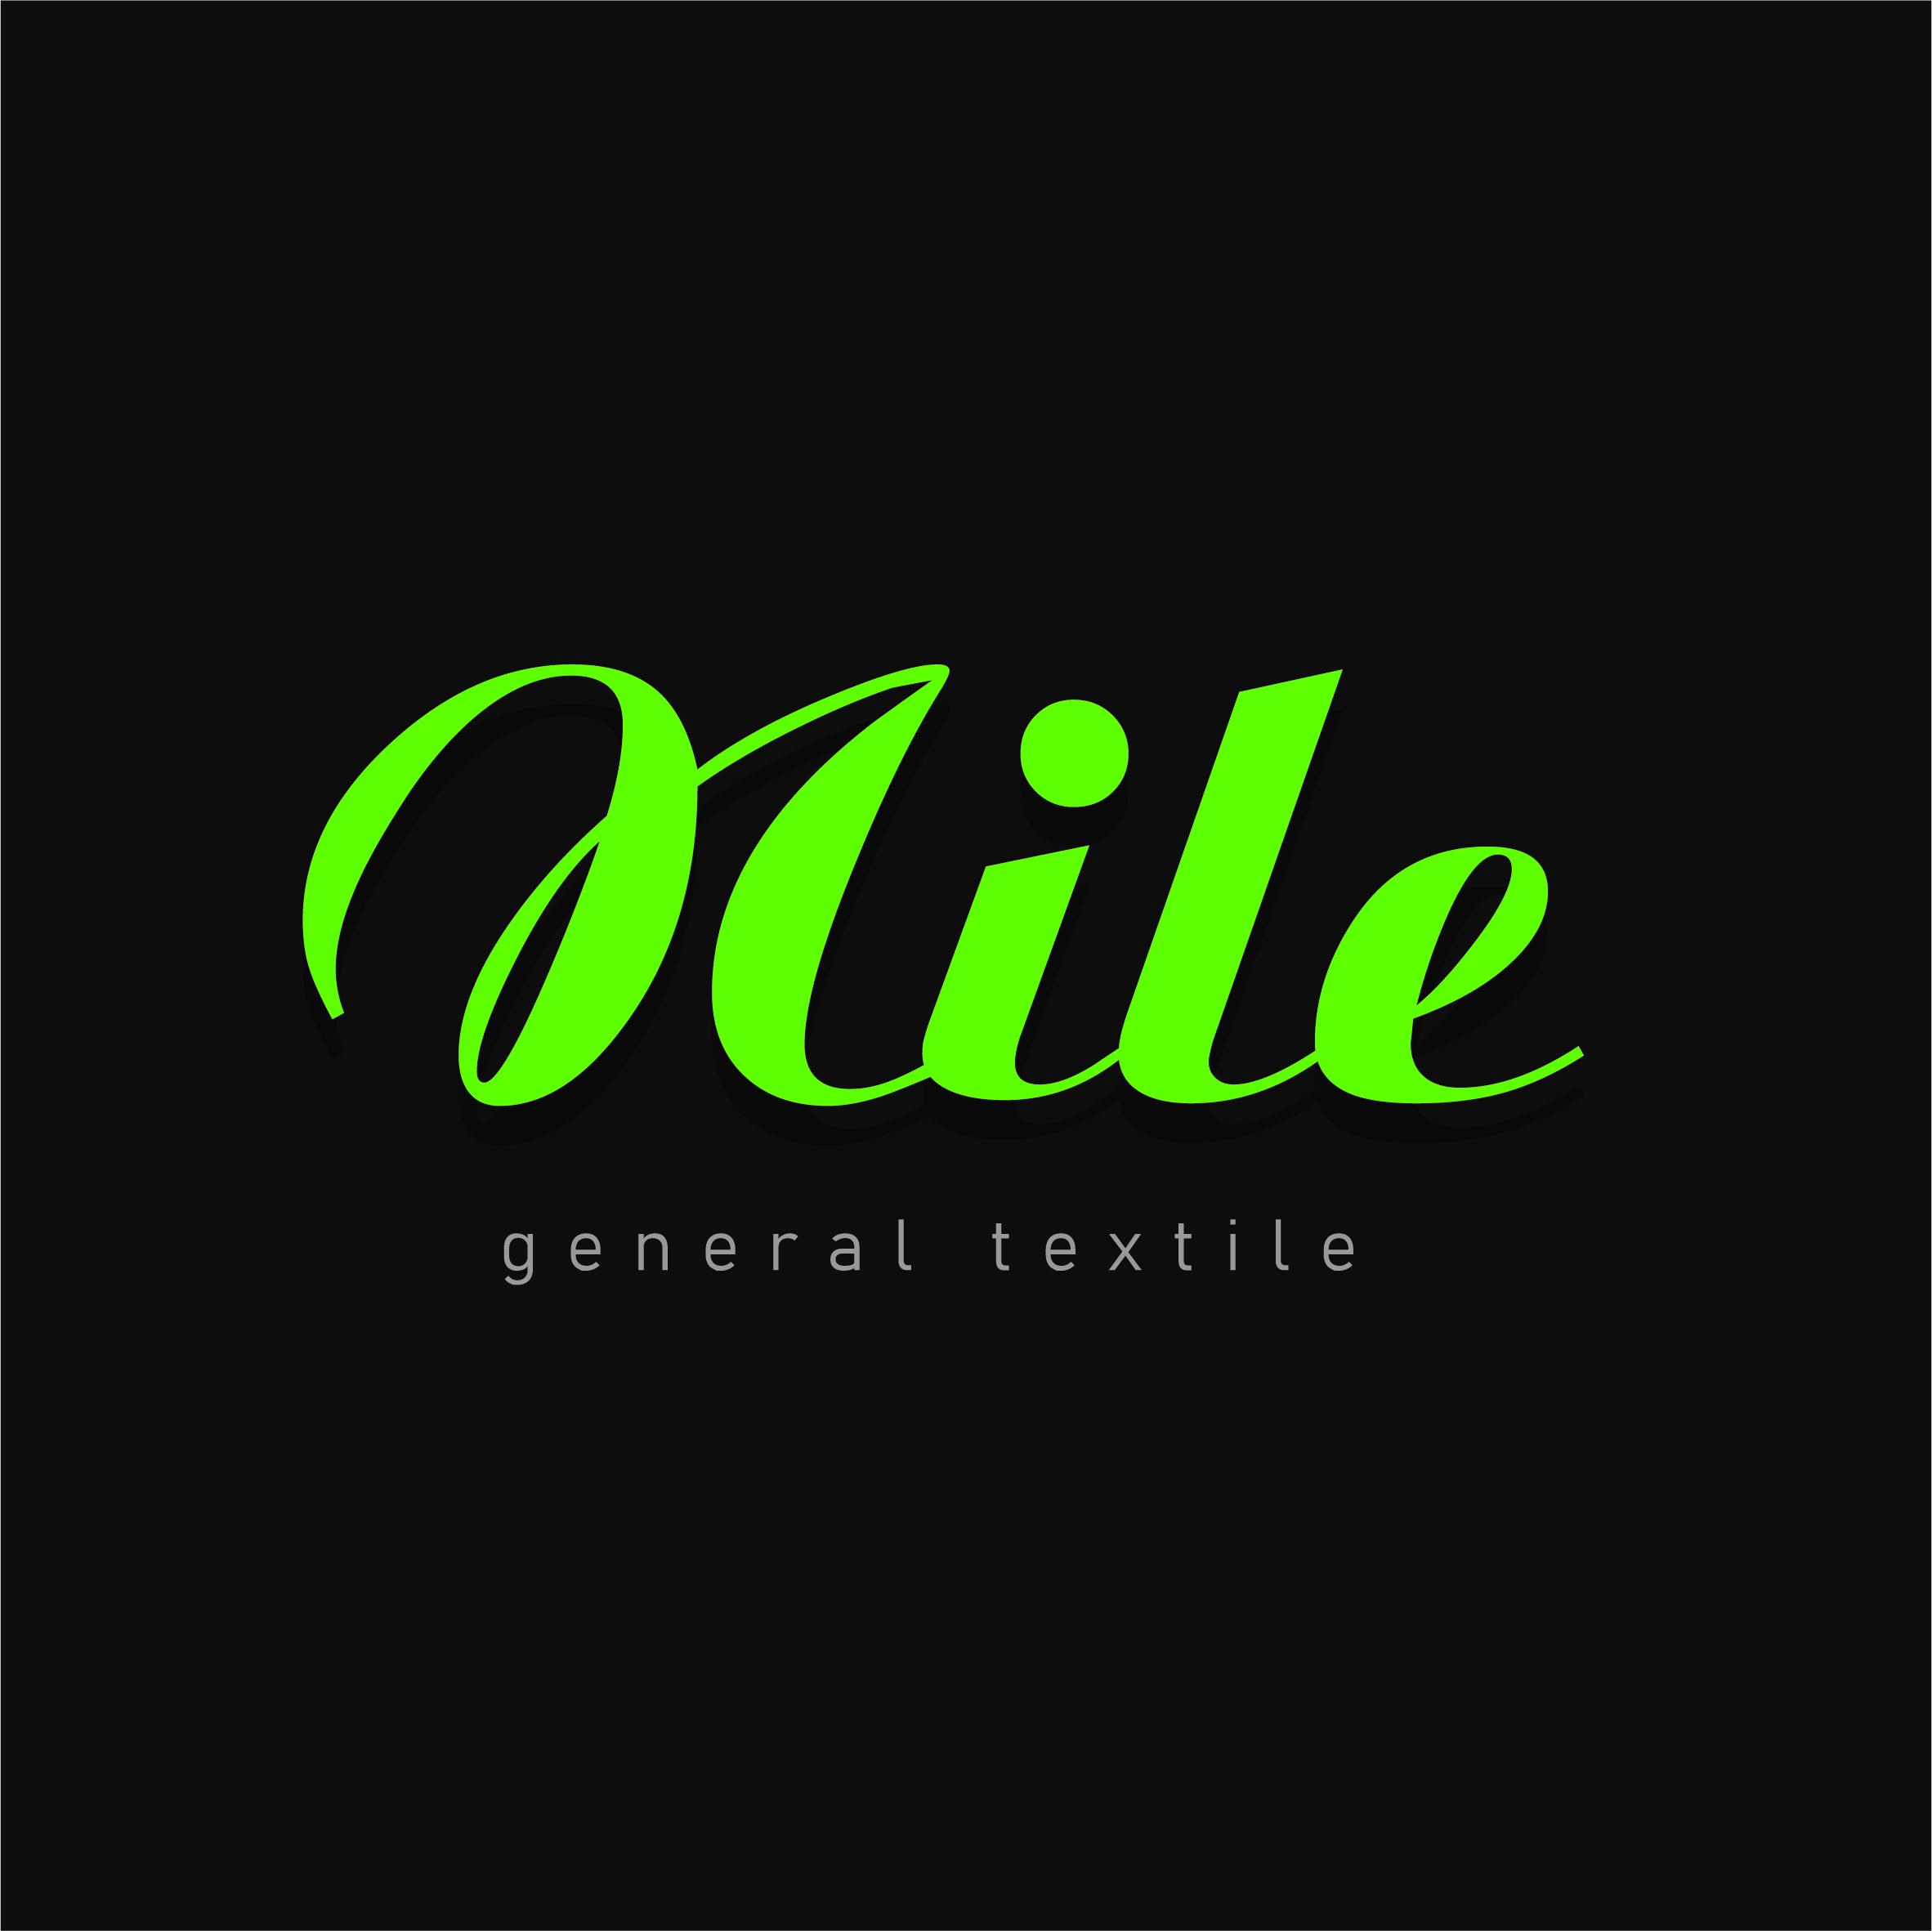 NILE GENERAL TEXTILE